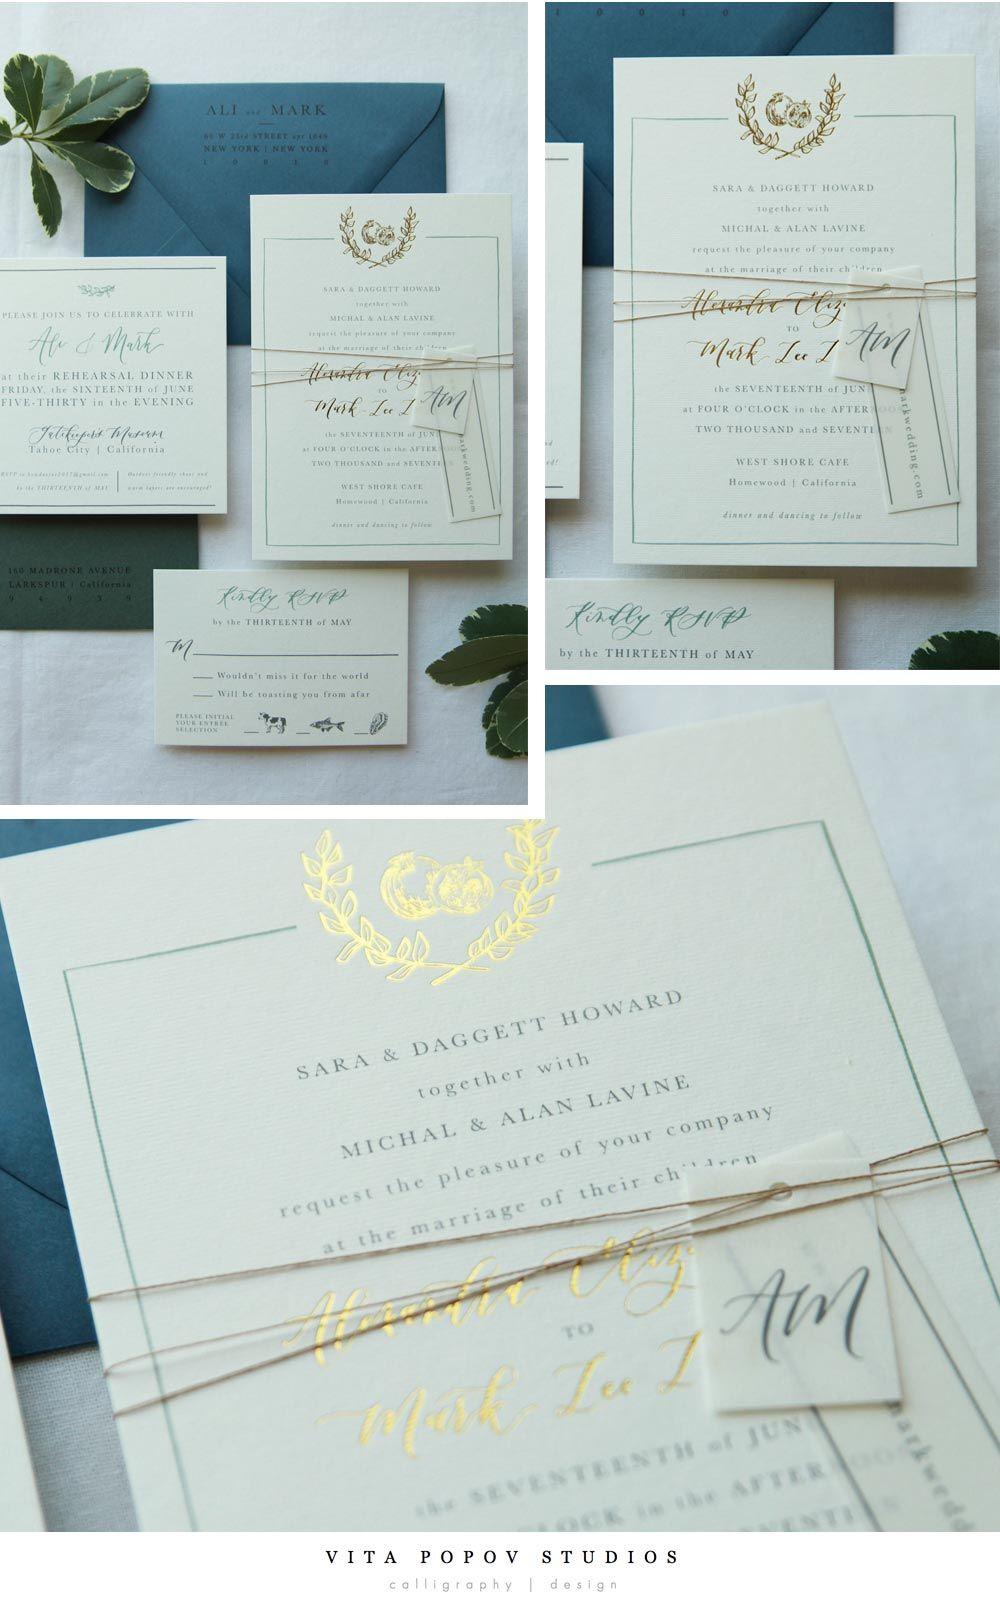 funny wedding invitation mail%0A Custom made simple wedding invitation suite by Vita Popov Studios